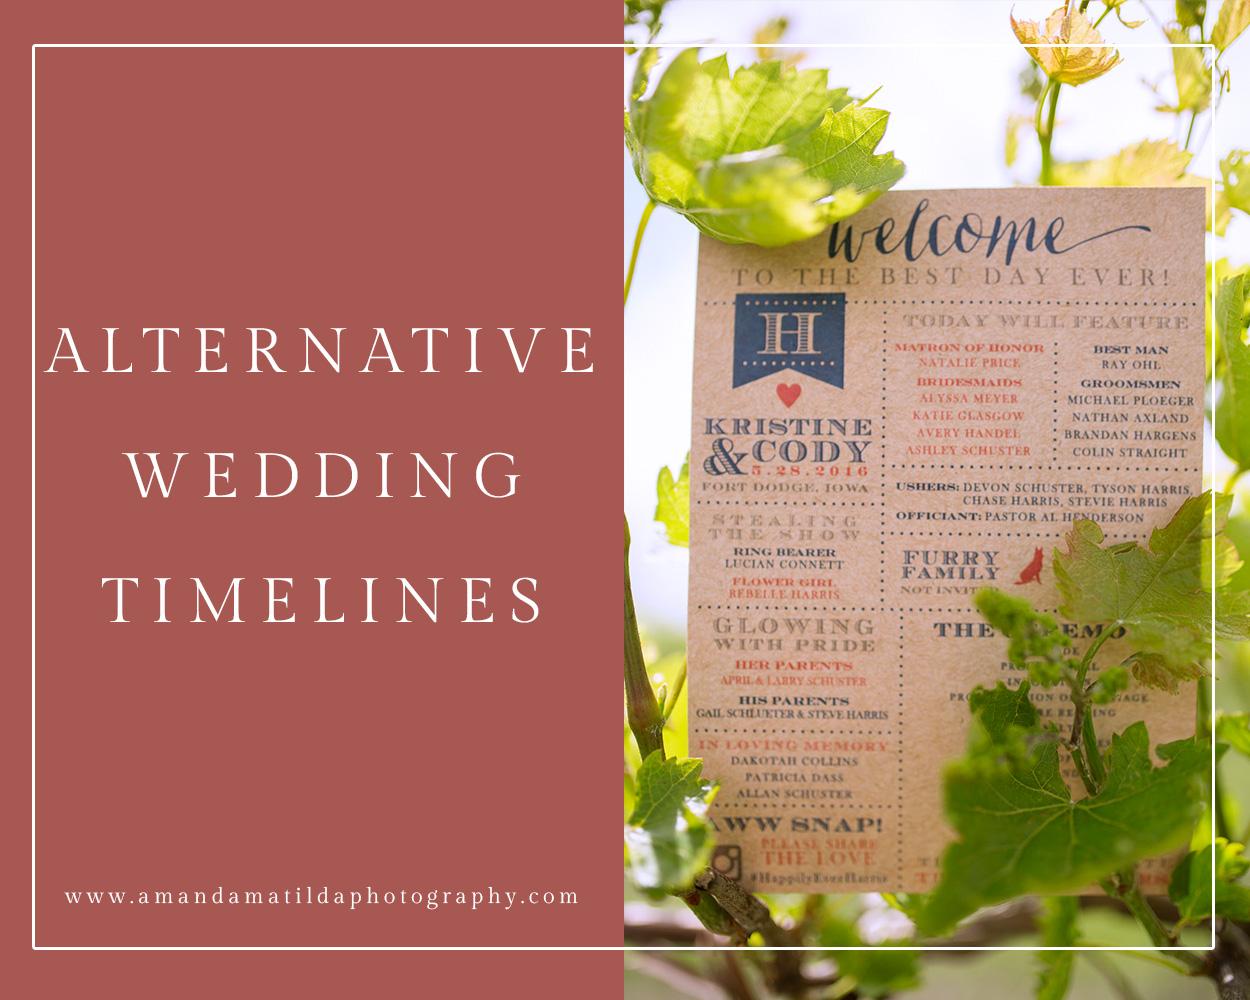 alternative wedding day timelines amanda matilda photography